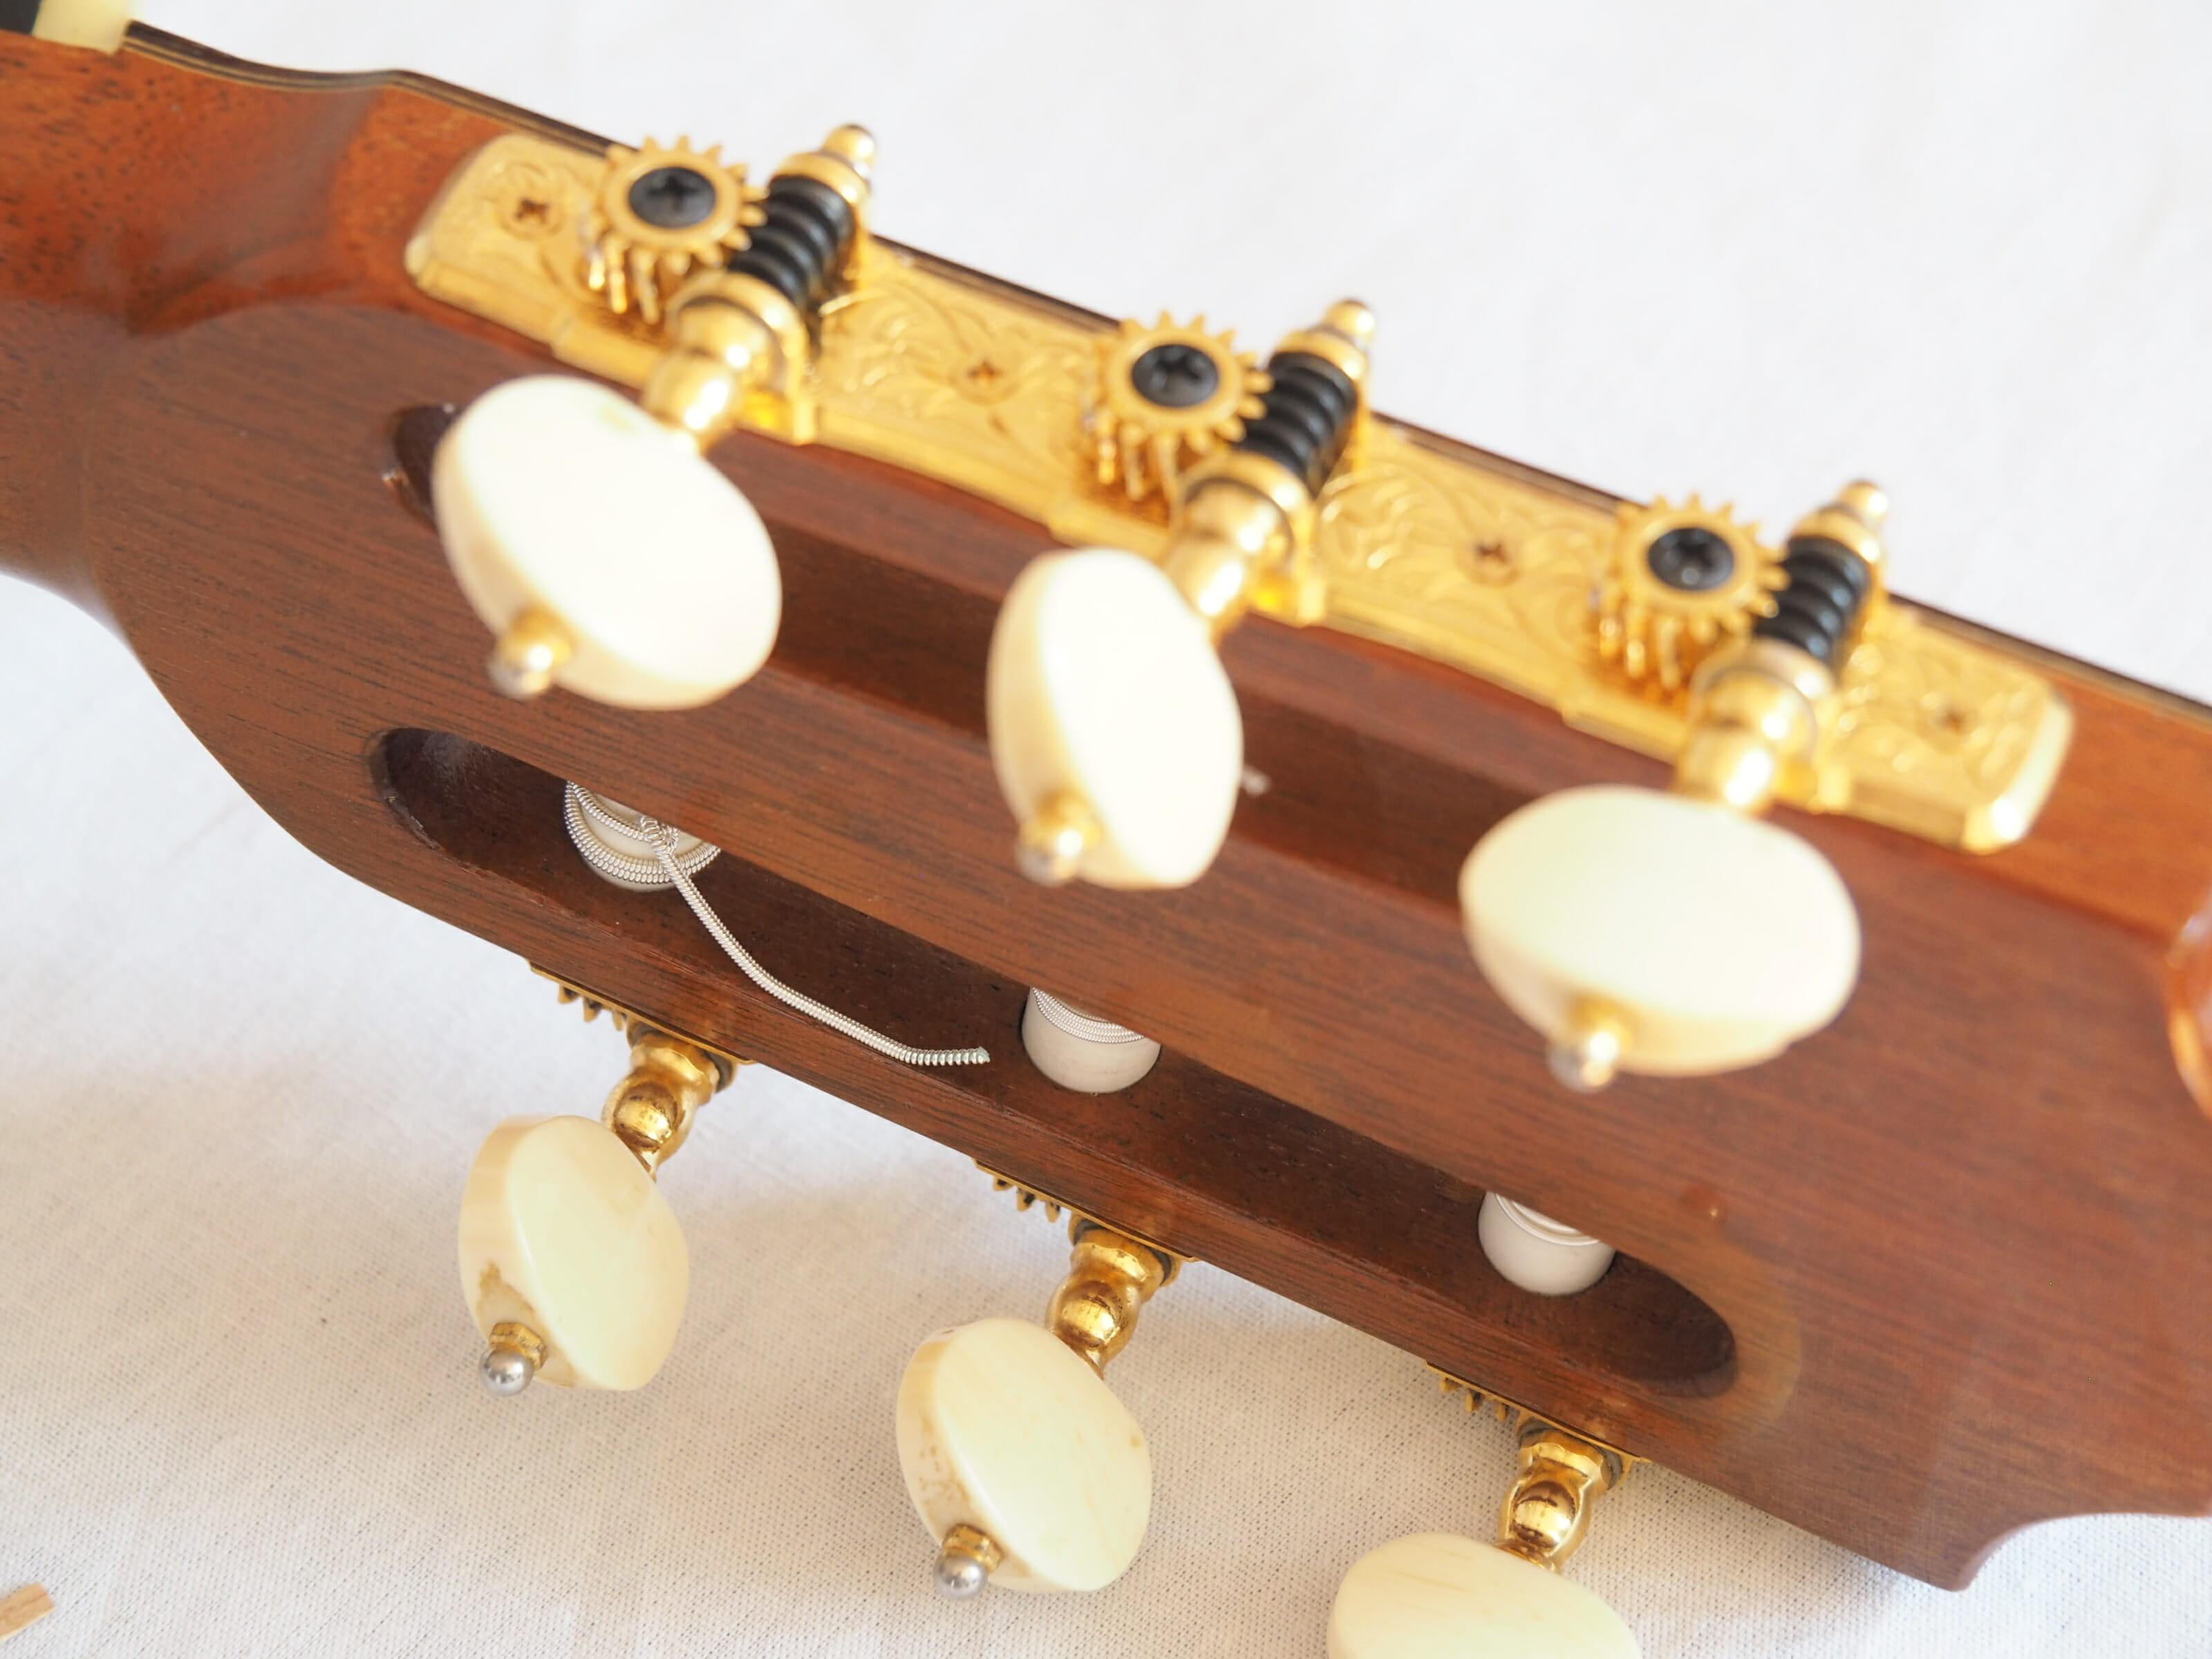 Daniel Friederich luthier guitare classique No 19FRI479-01